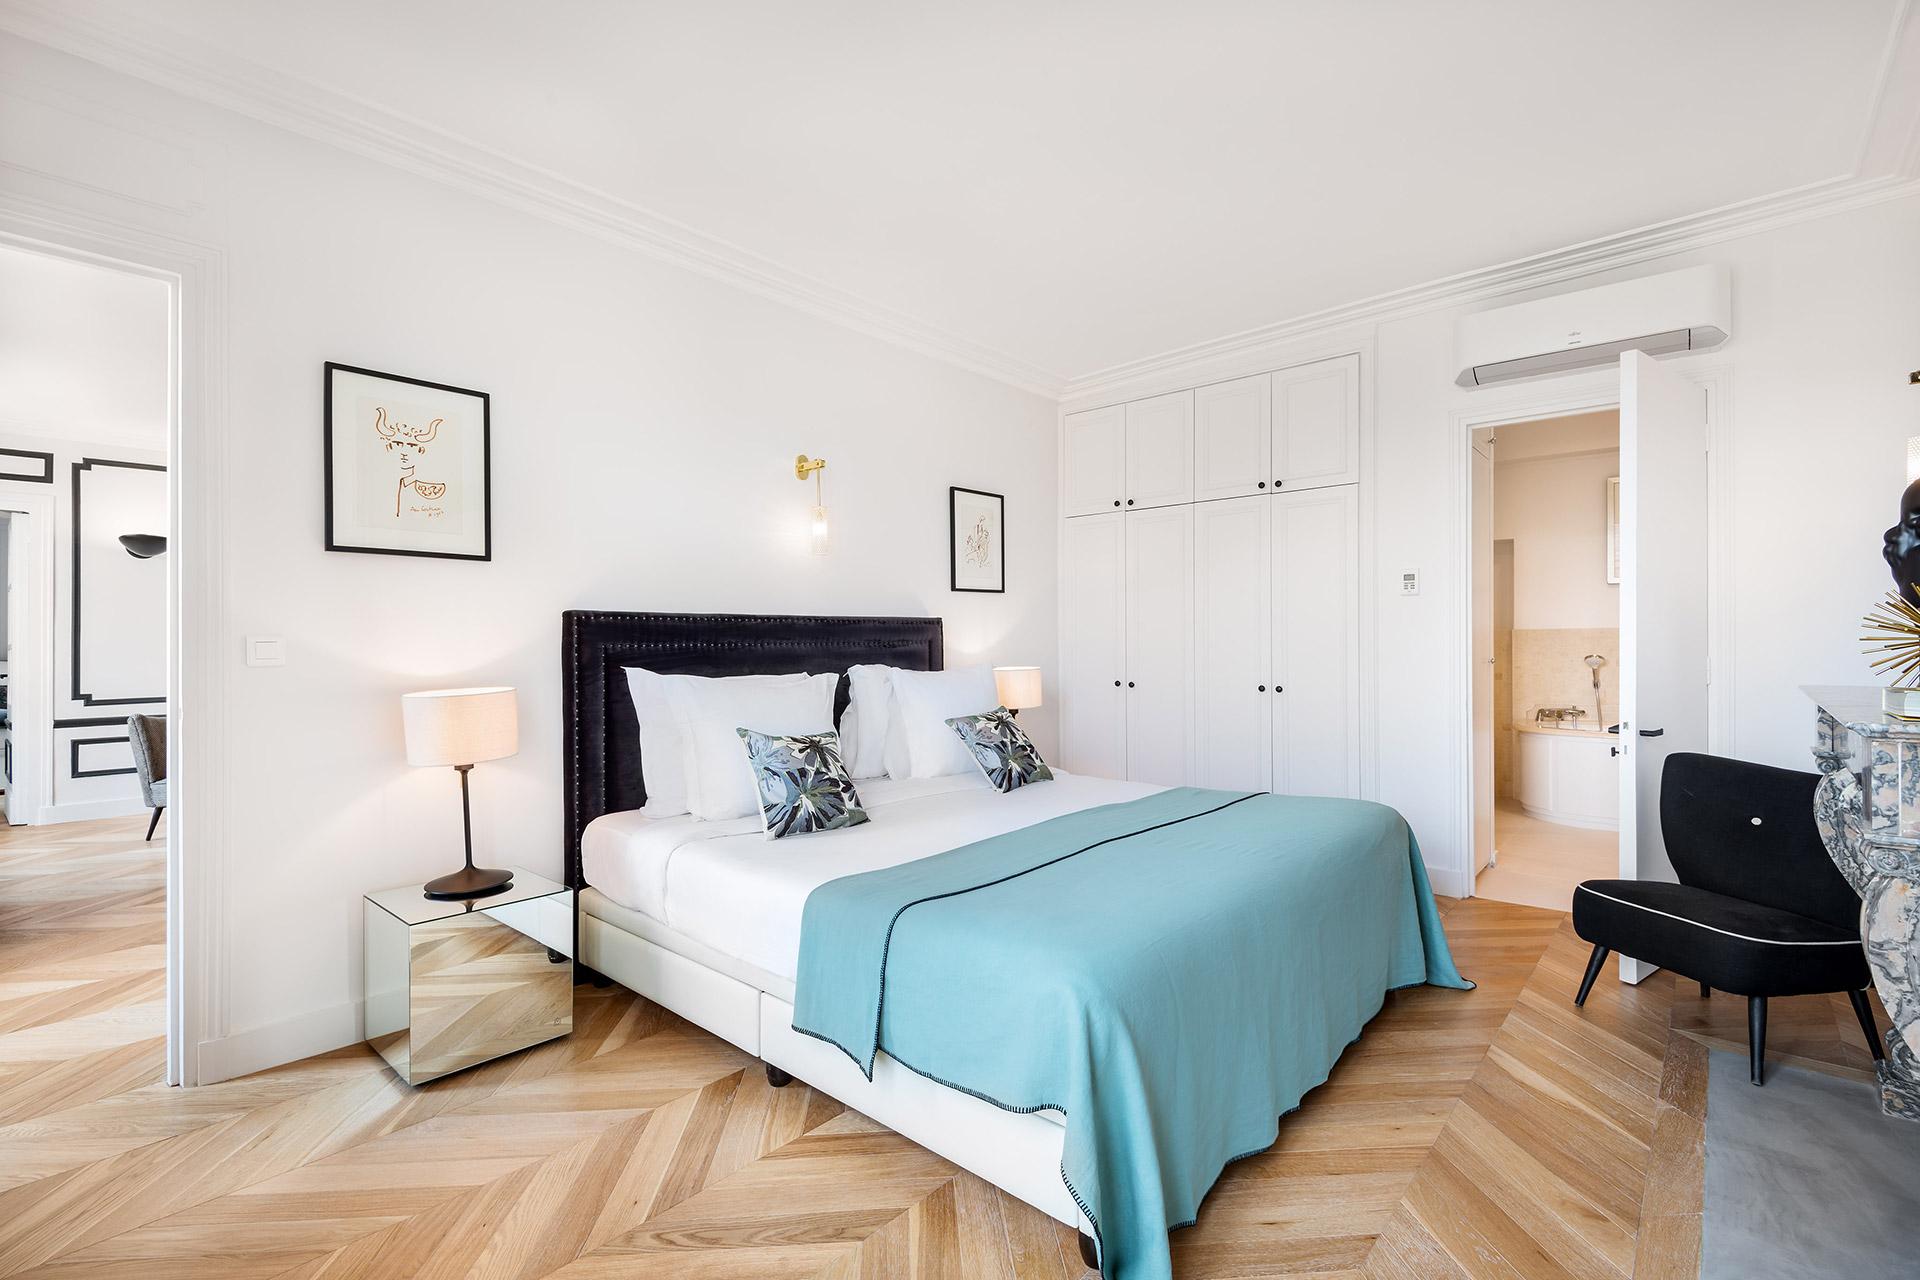 Bedroom 1 with en suite bathroom in the Chevalier vacation rental by Paris Perfect